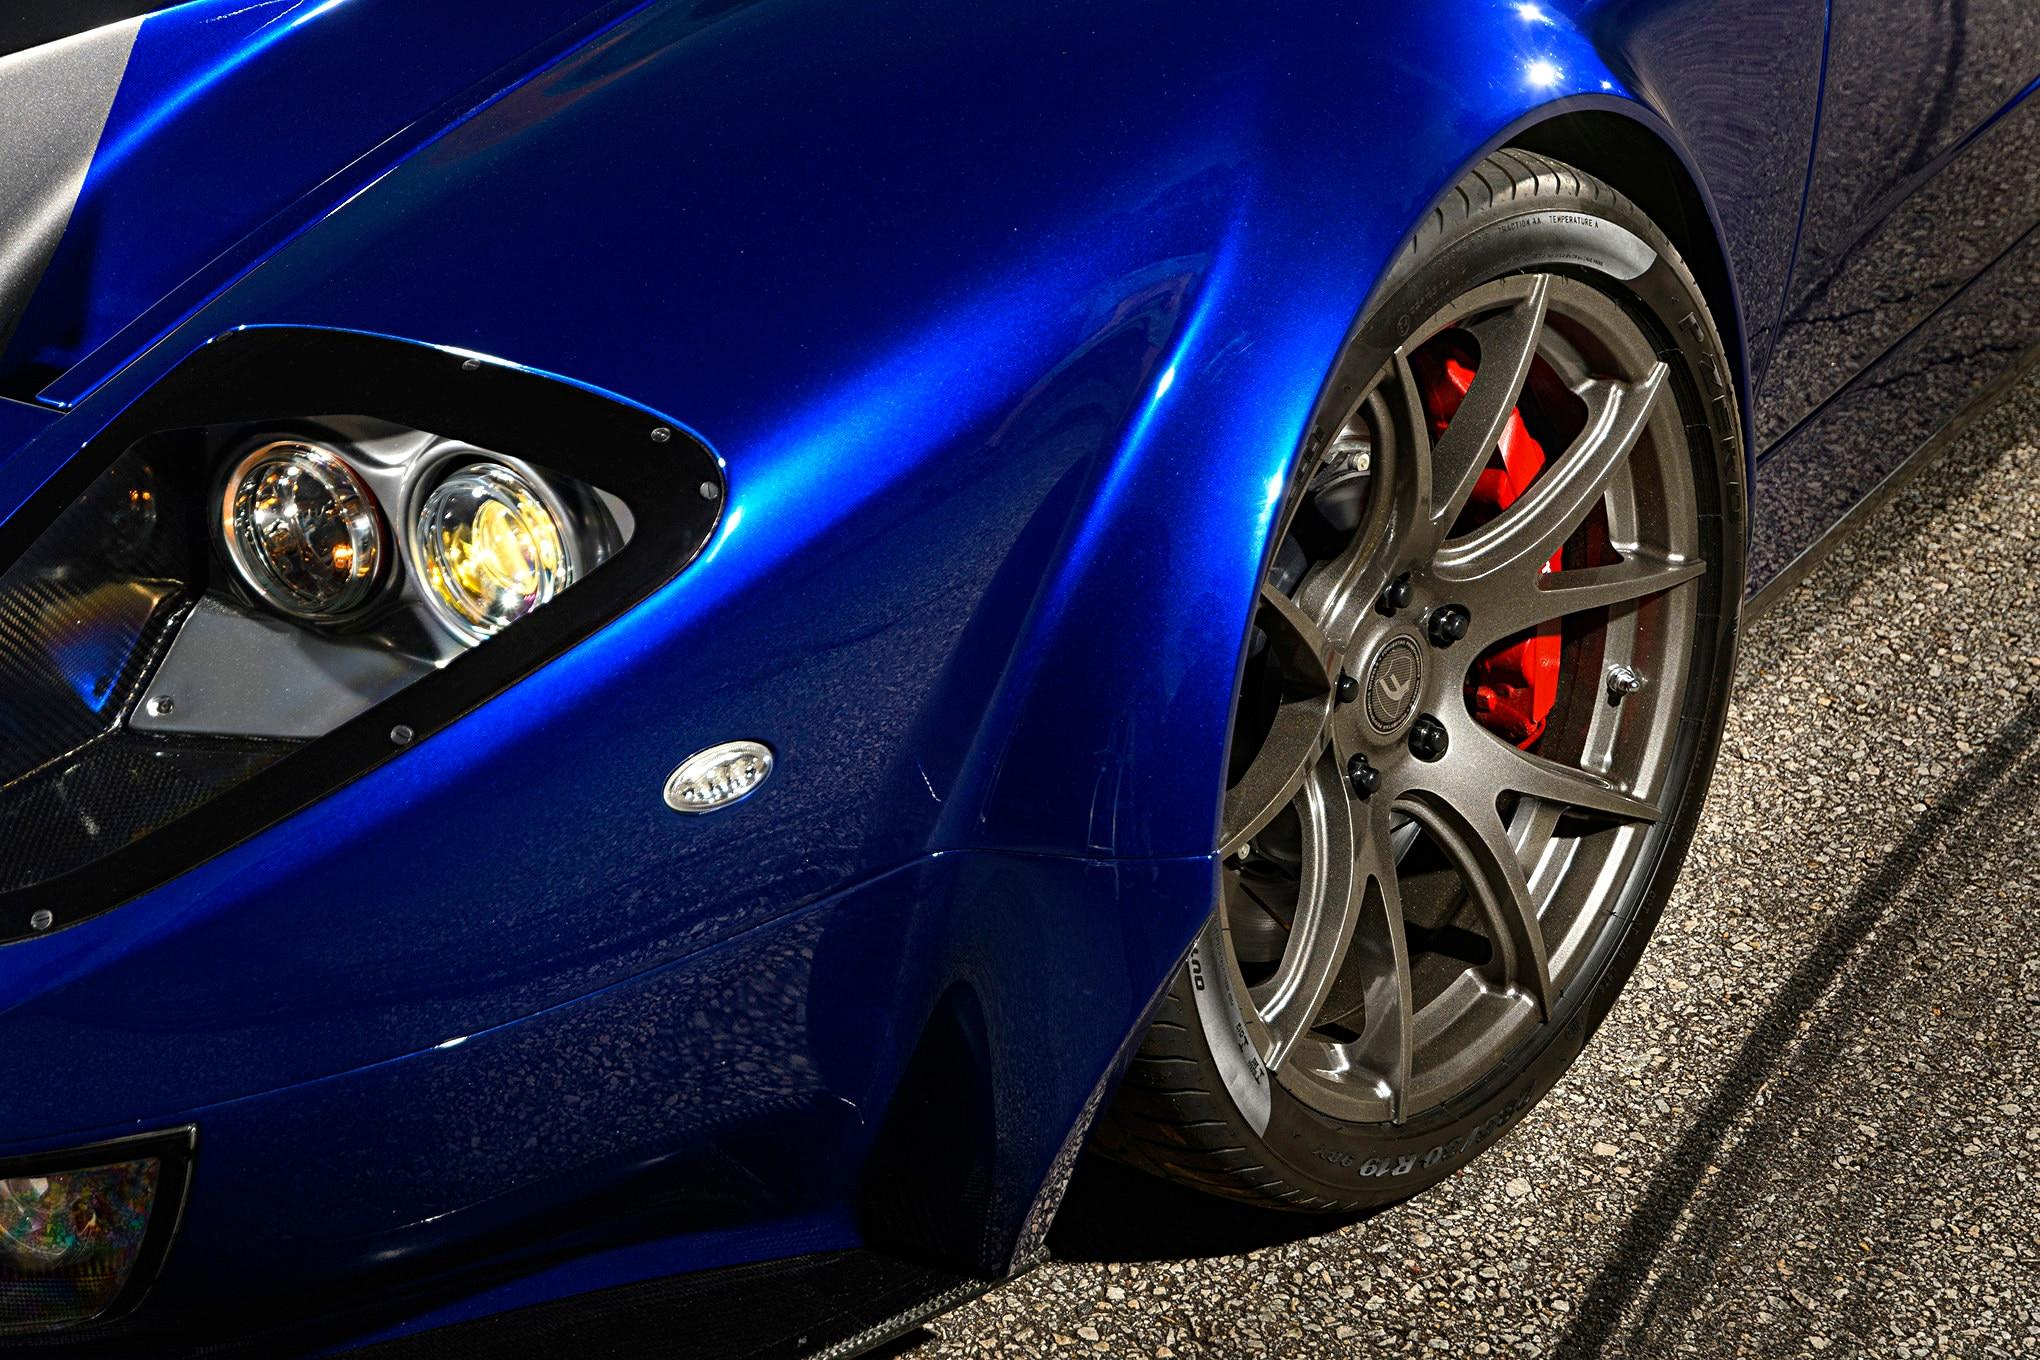 009-Superlite-GT-R-wheel.jpg